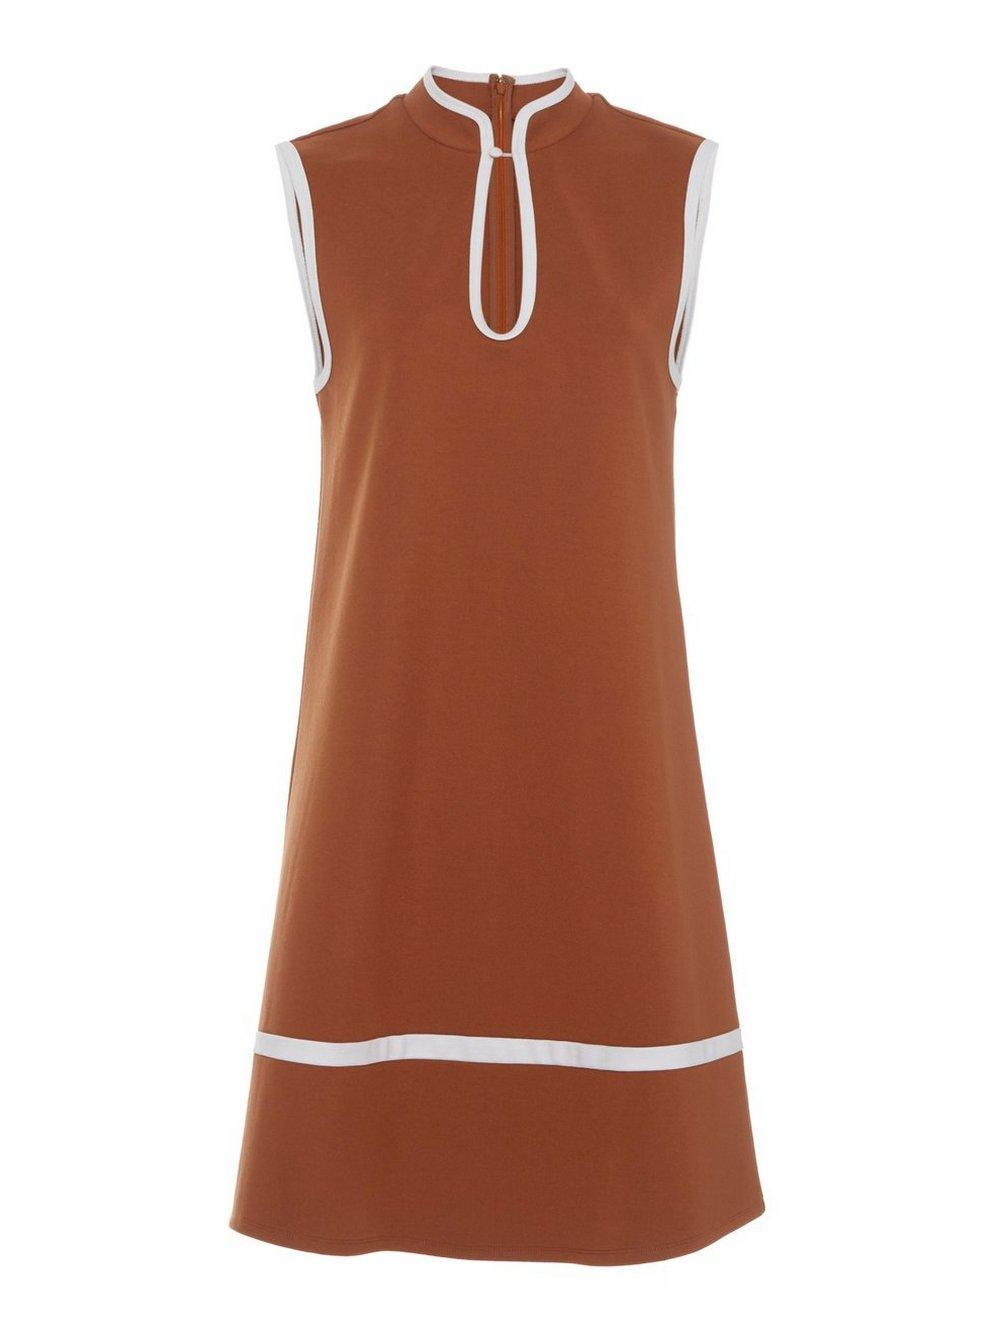 Thea Ponte Sleeveless Dress Item # 46-7342-TAN